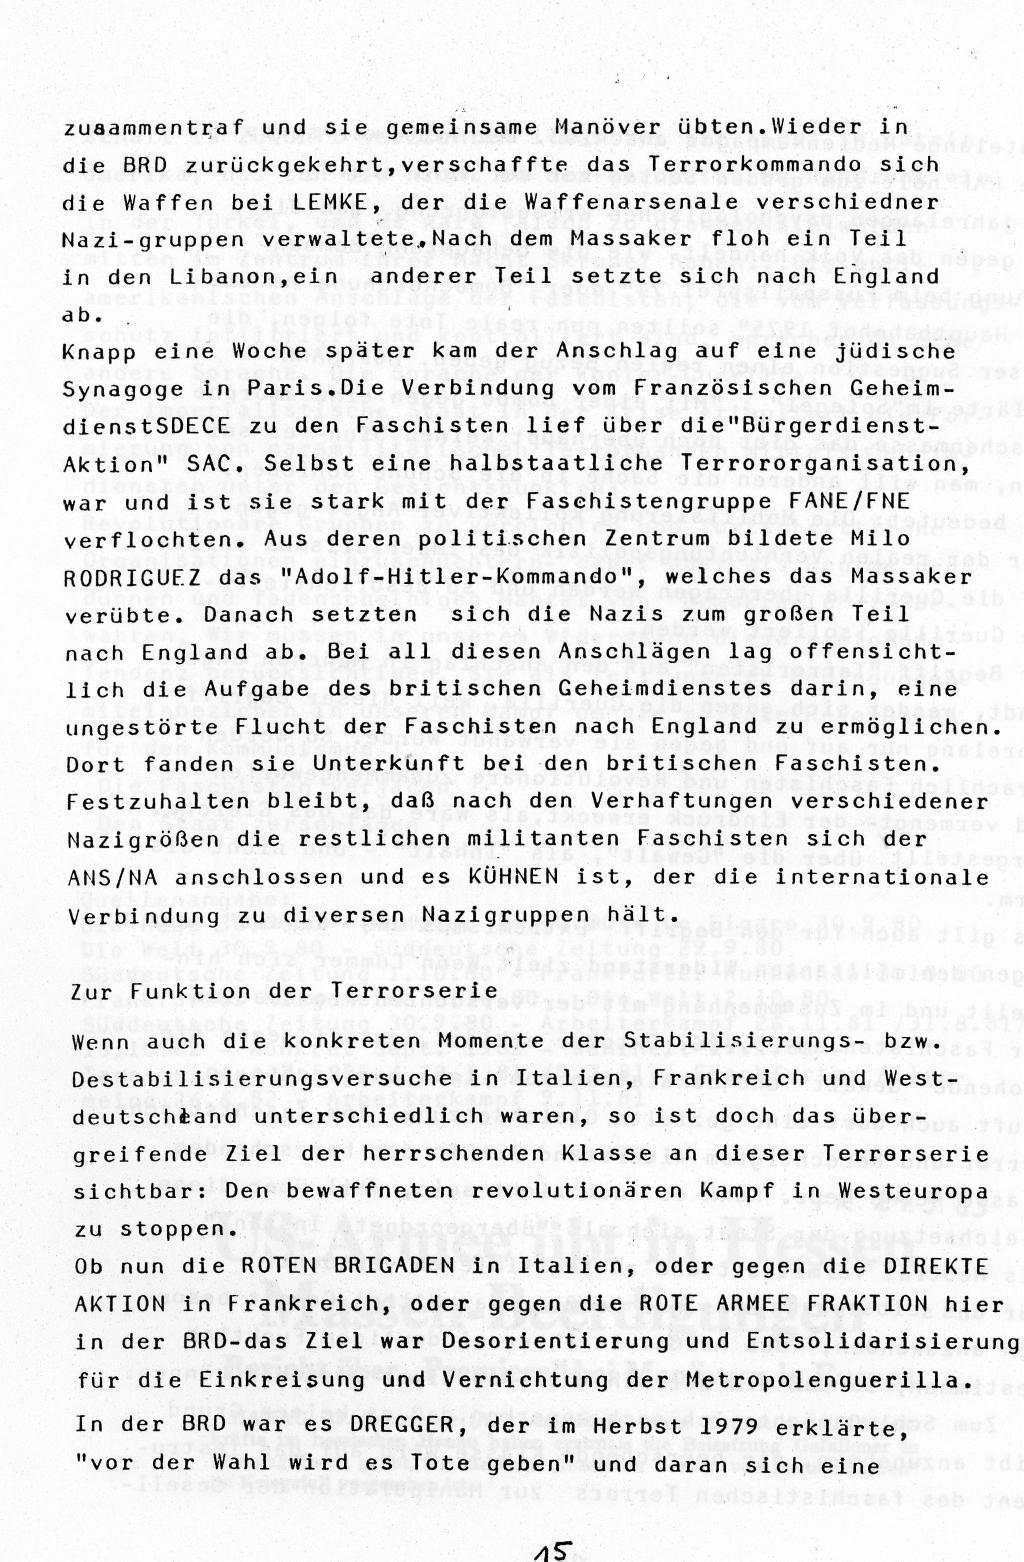 Berlin_1983_Autonome_Gruppen_Faschismus_im_Kapitalismus_15